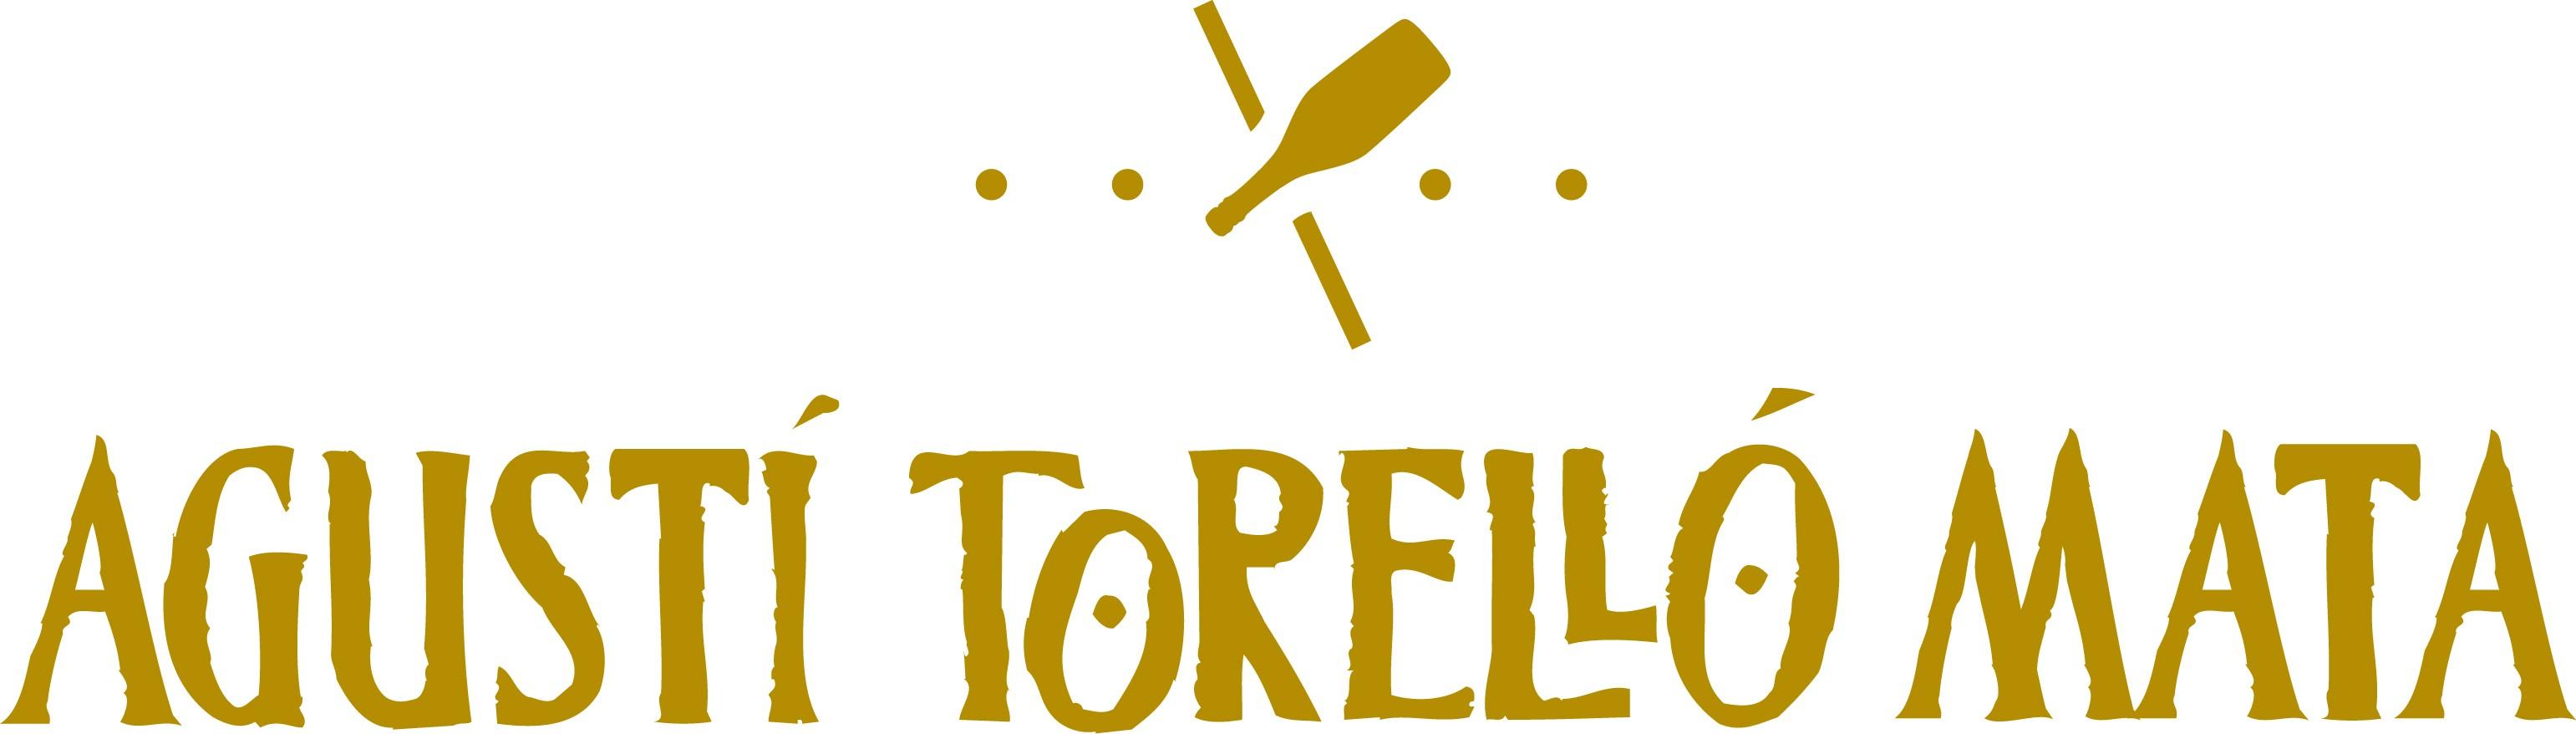 Logo comerç AGUSTÍ TORELLÓ MATA